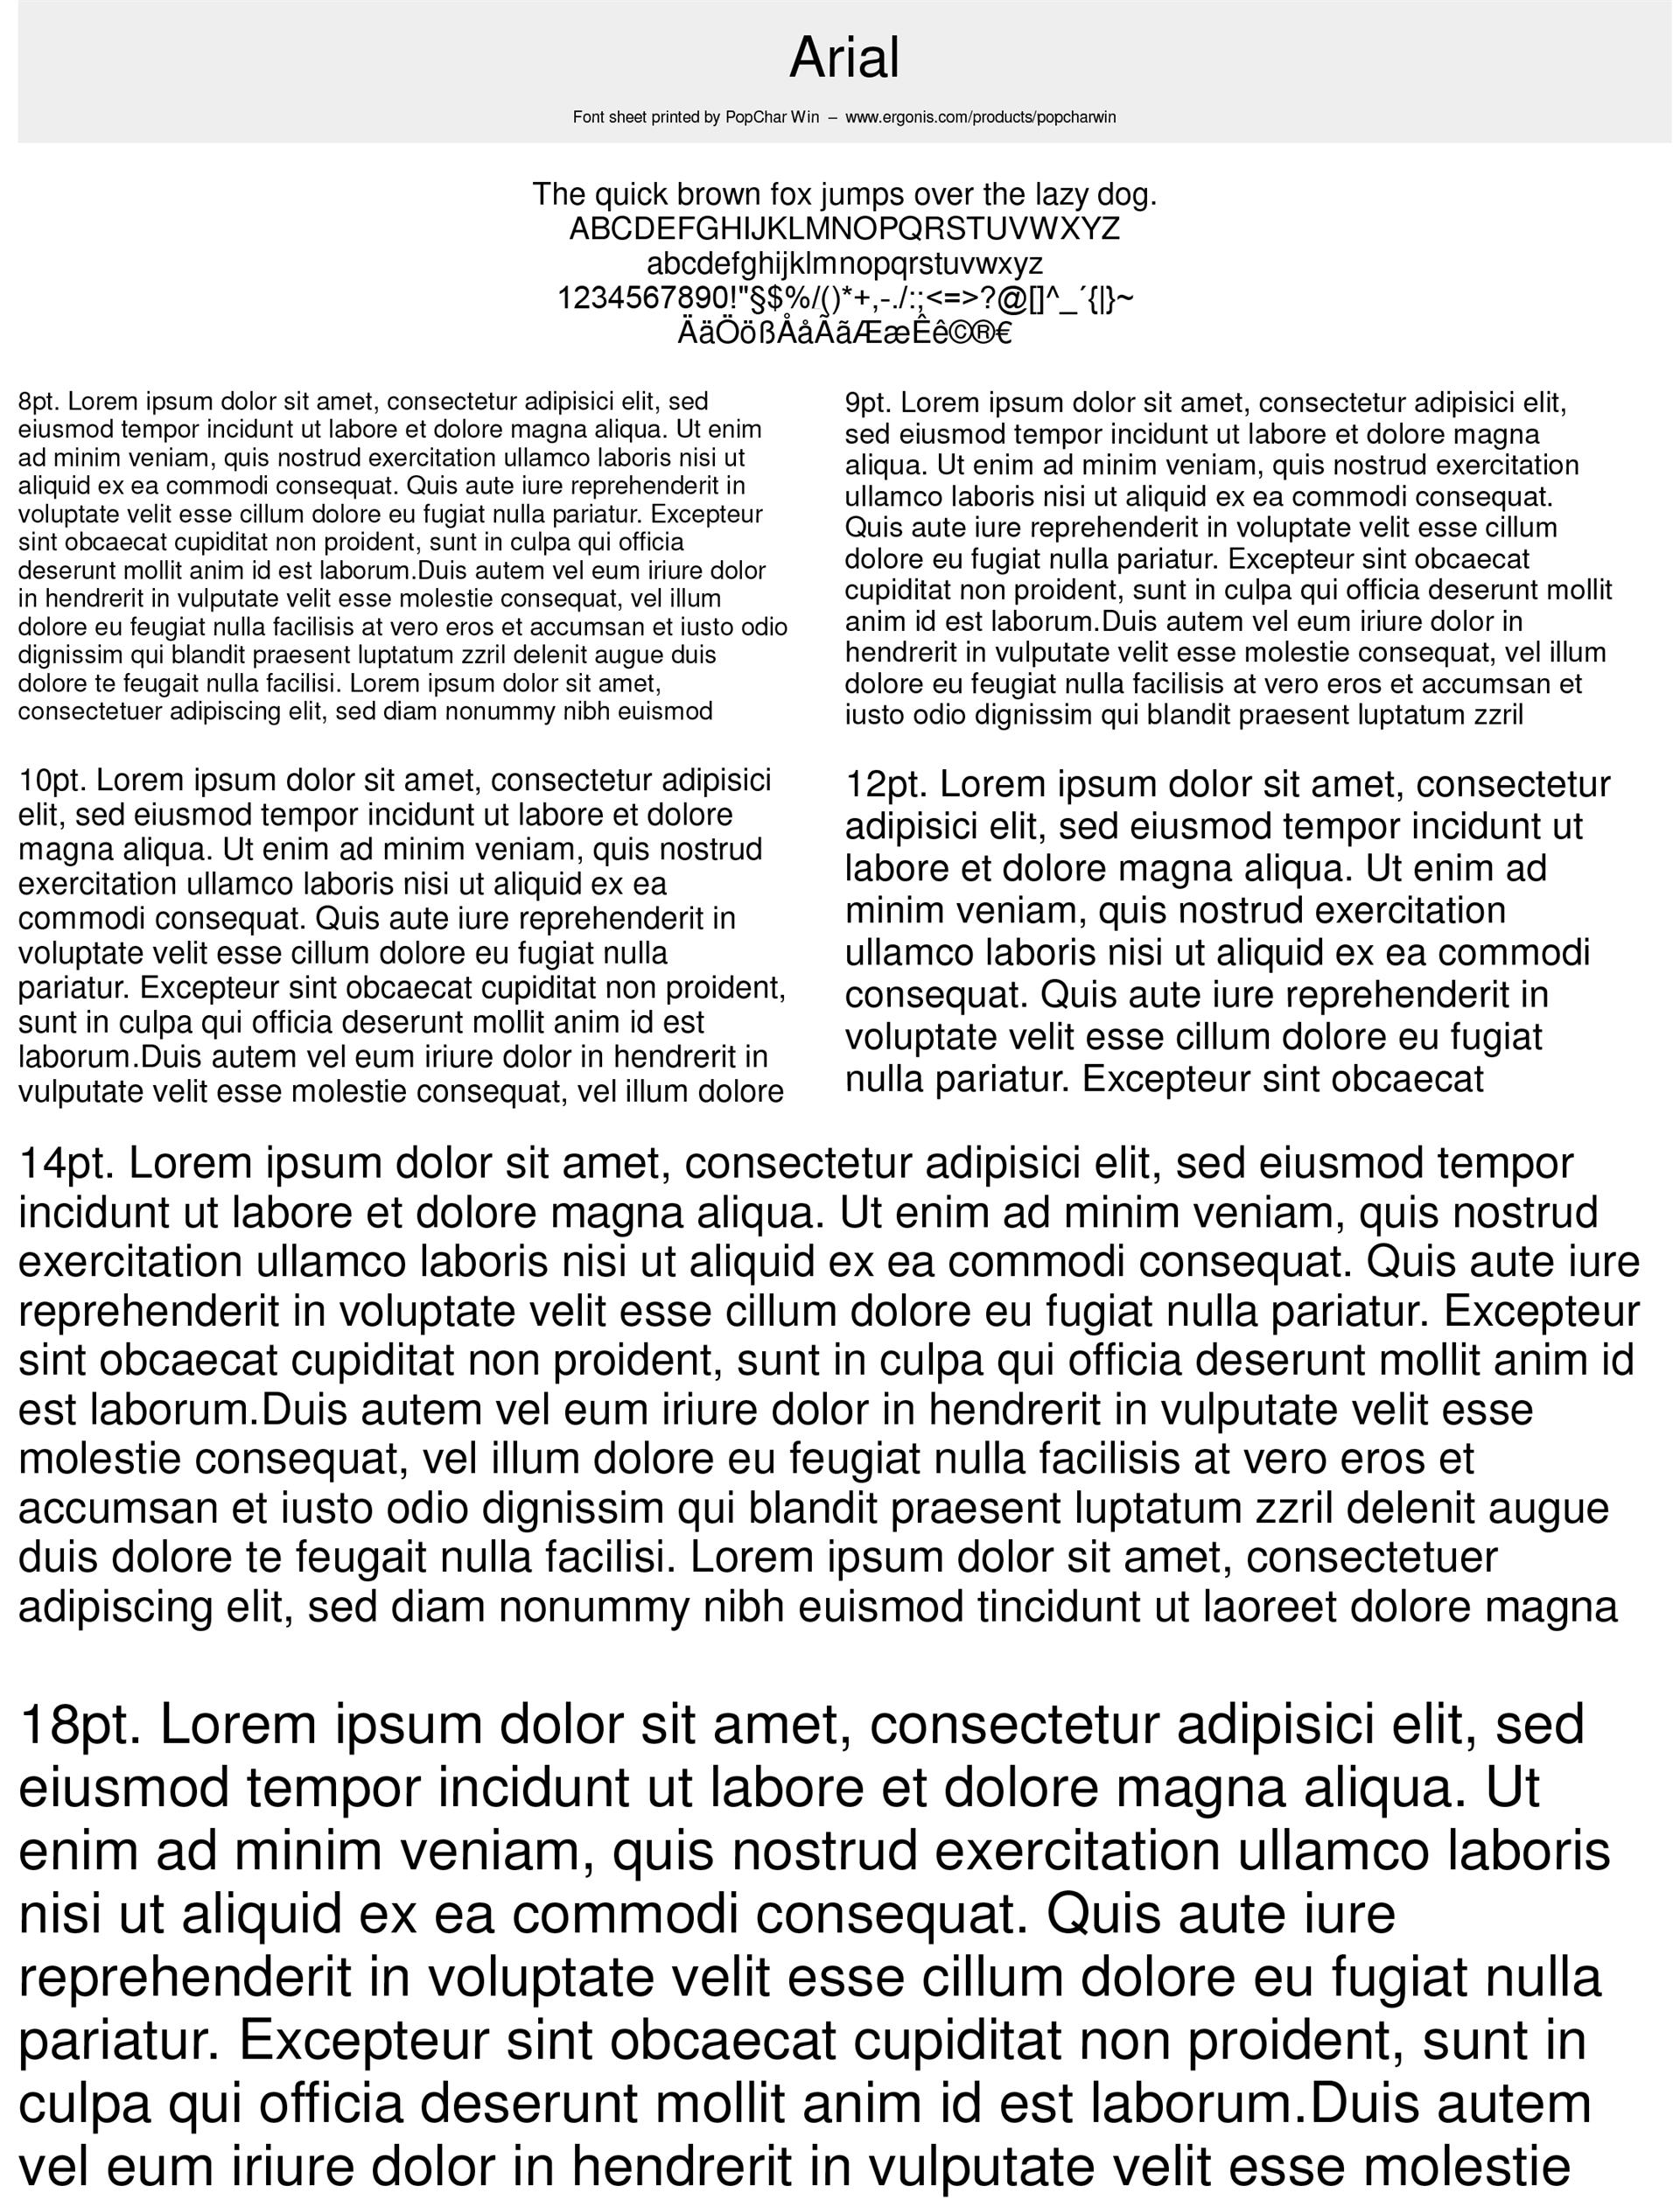 Design, Photo & Graphics Software, Fonts and Font Tools Software Screenshot